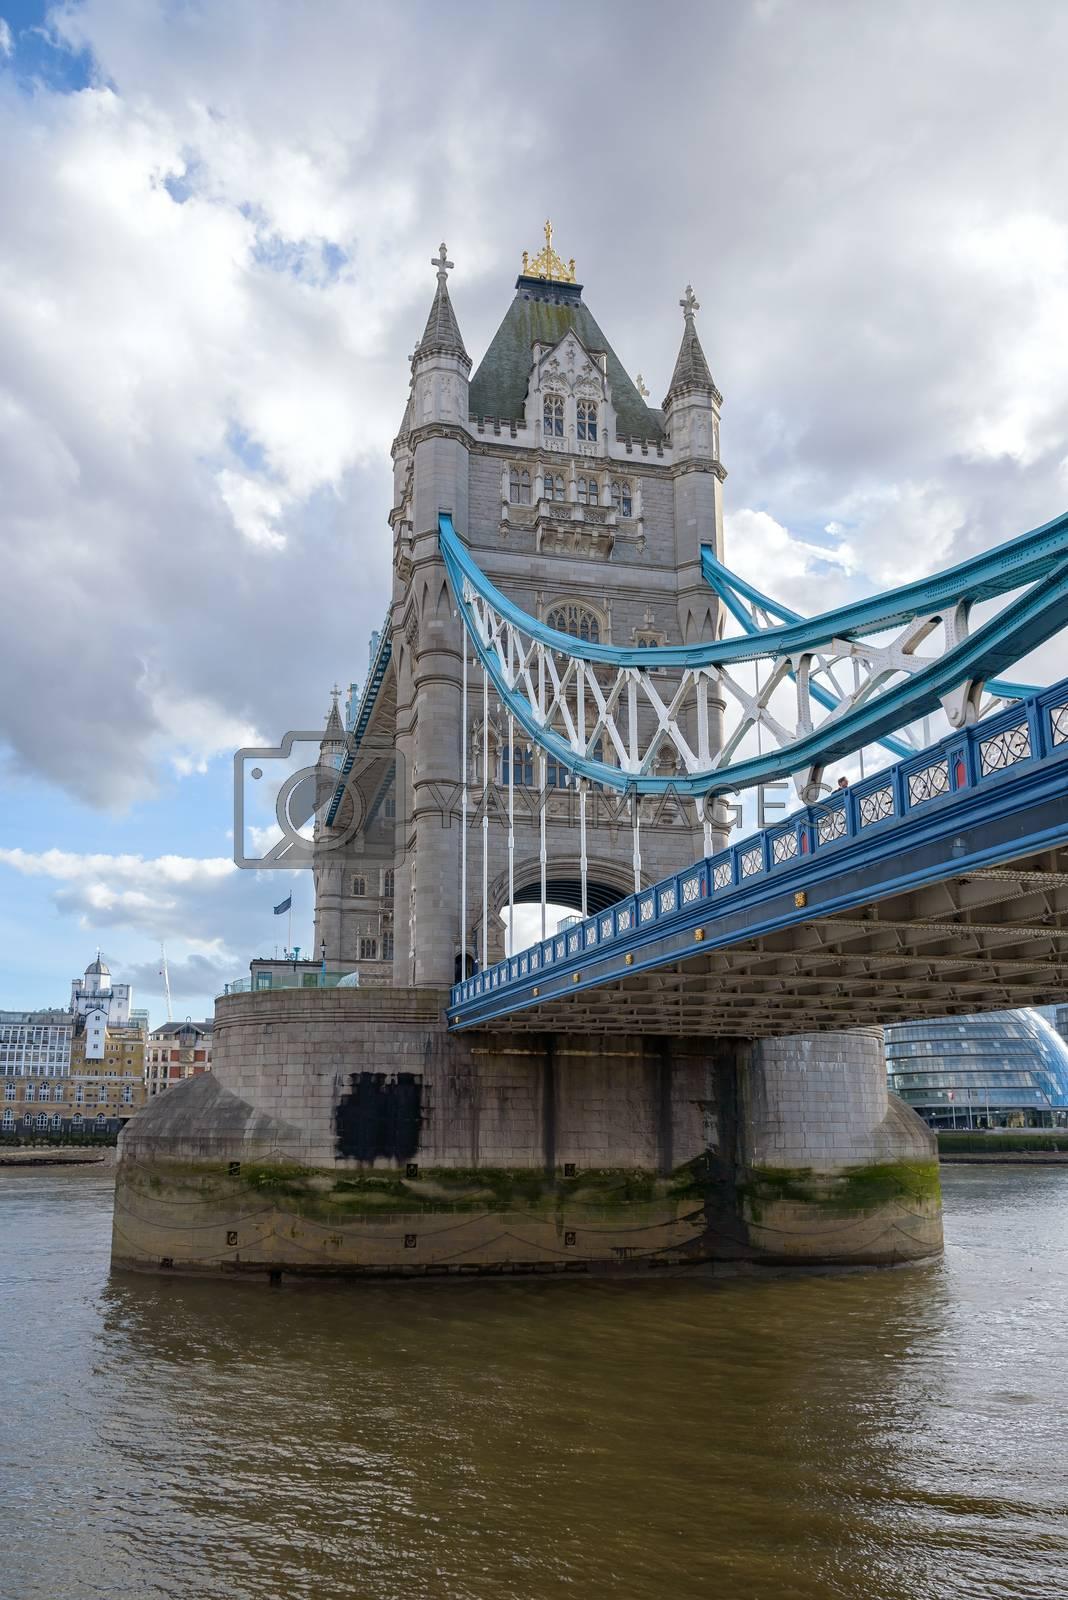 View of Tower Bridge, bascule and suspension bridge in London, UK